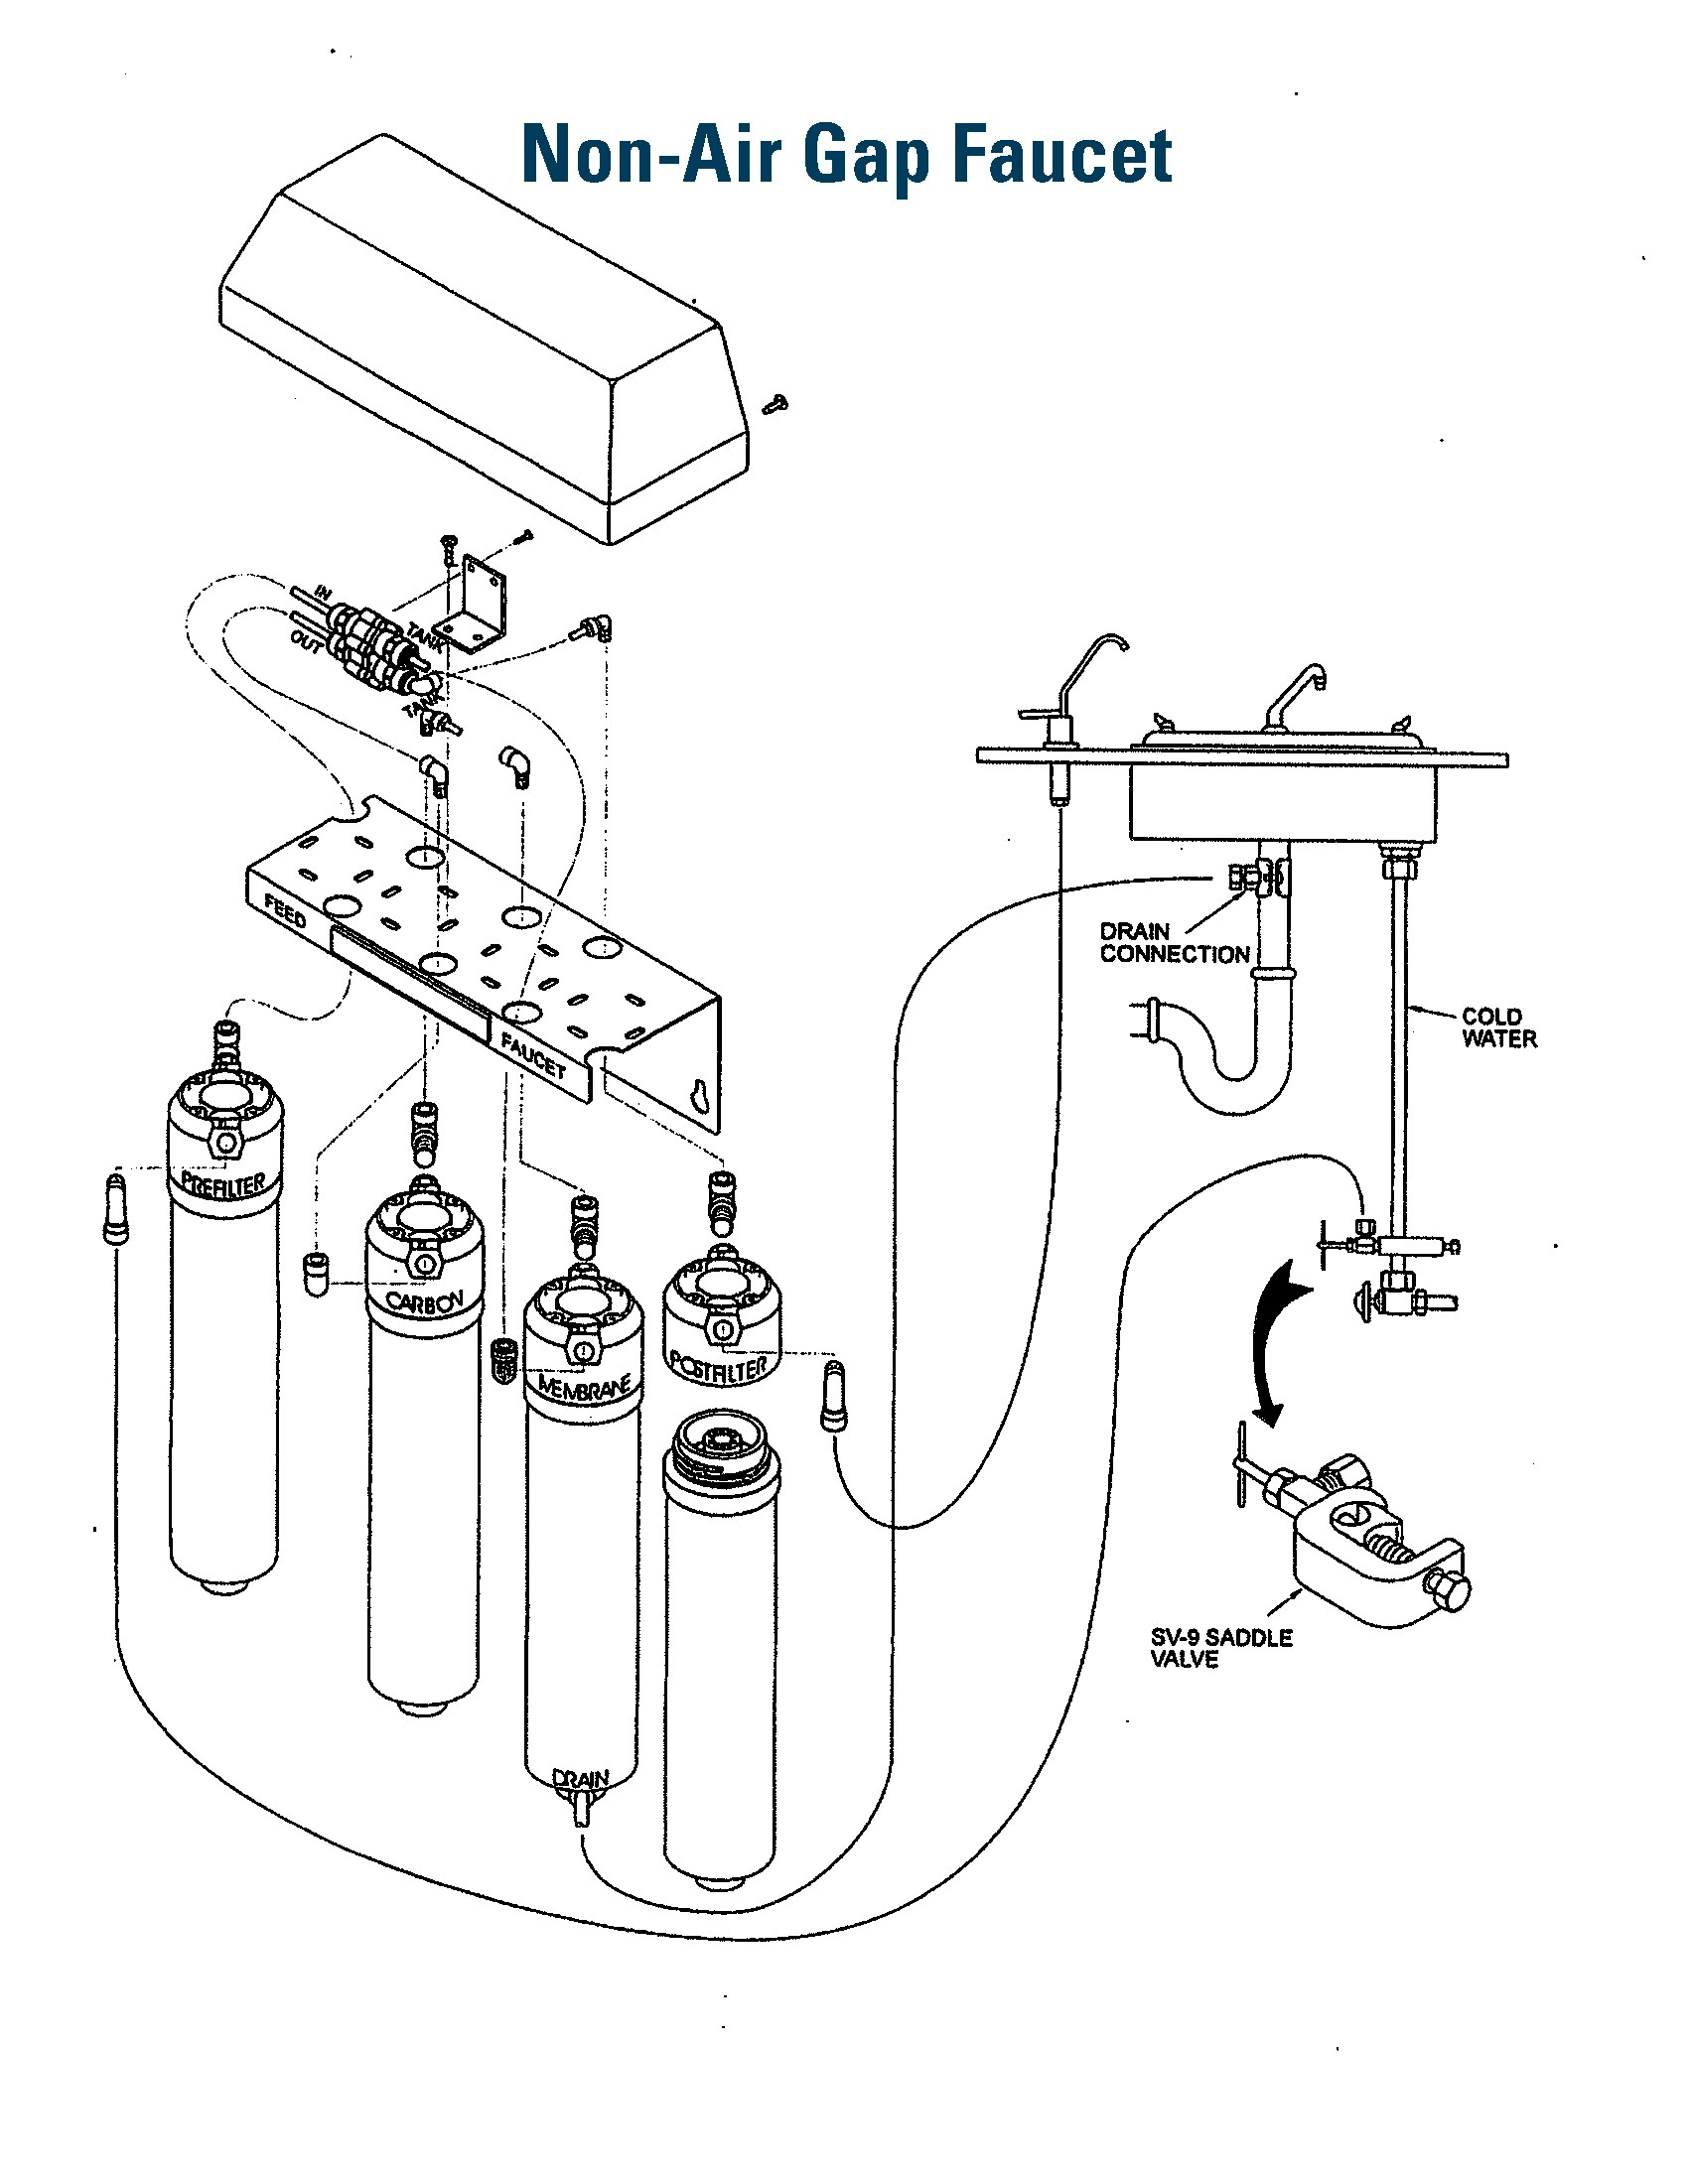 hight resolution of non air gap faucet diagram